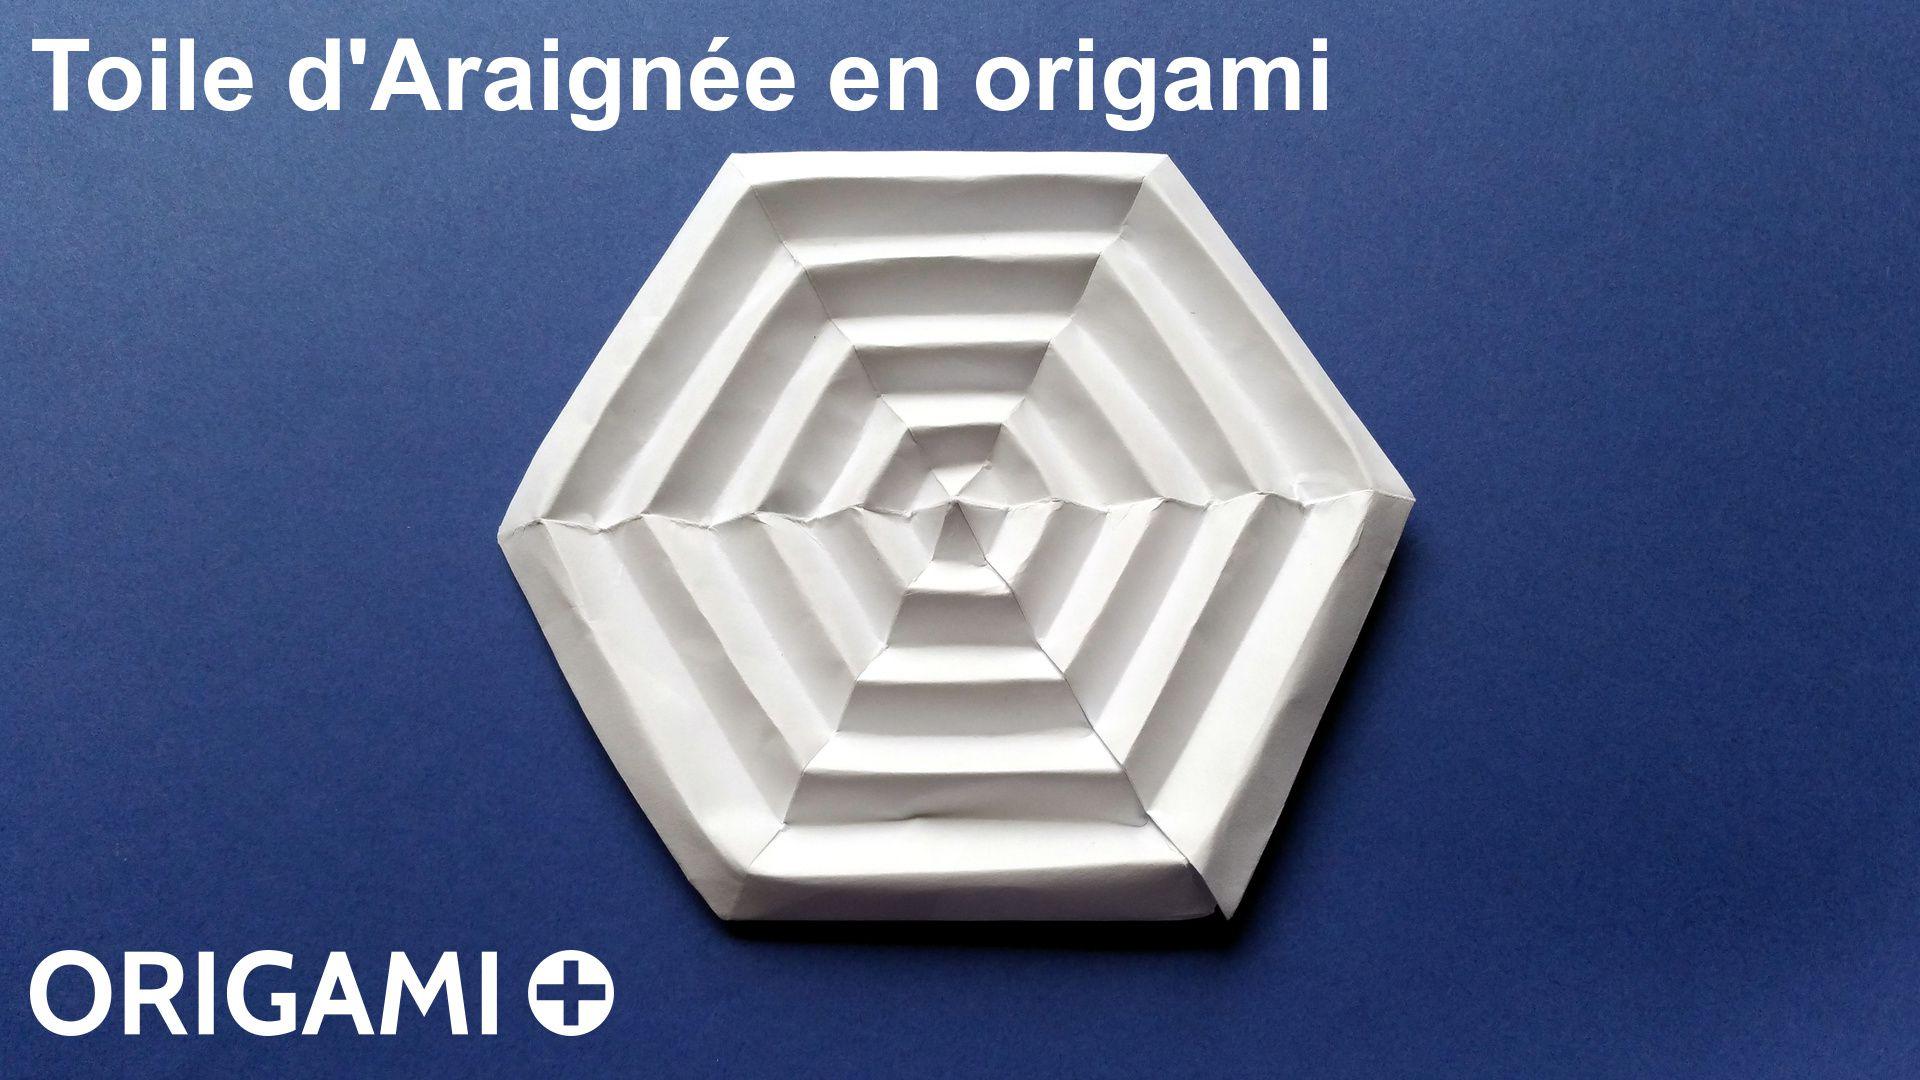 toile d'araignée en origami